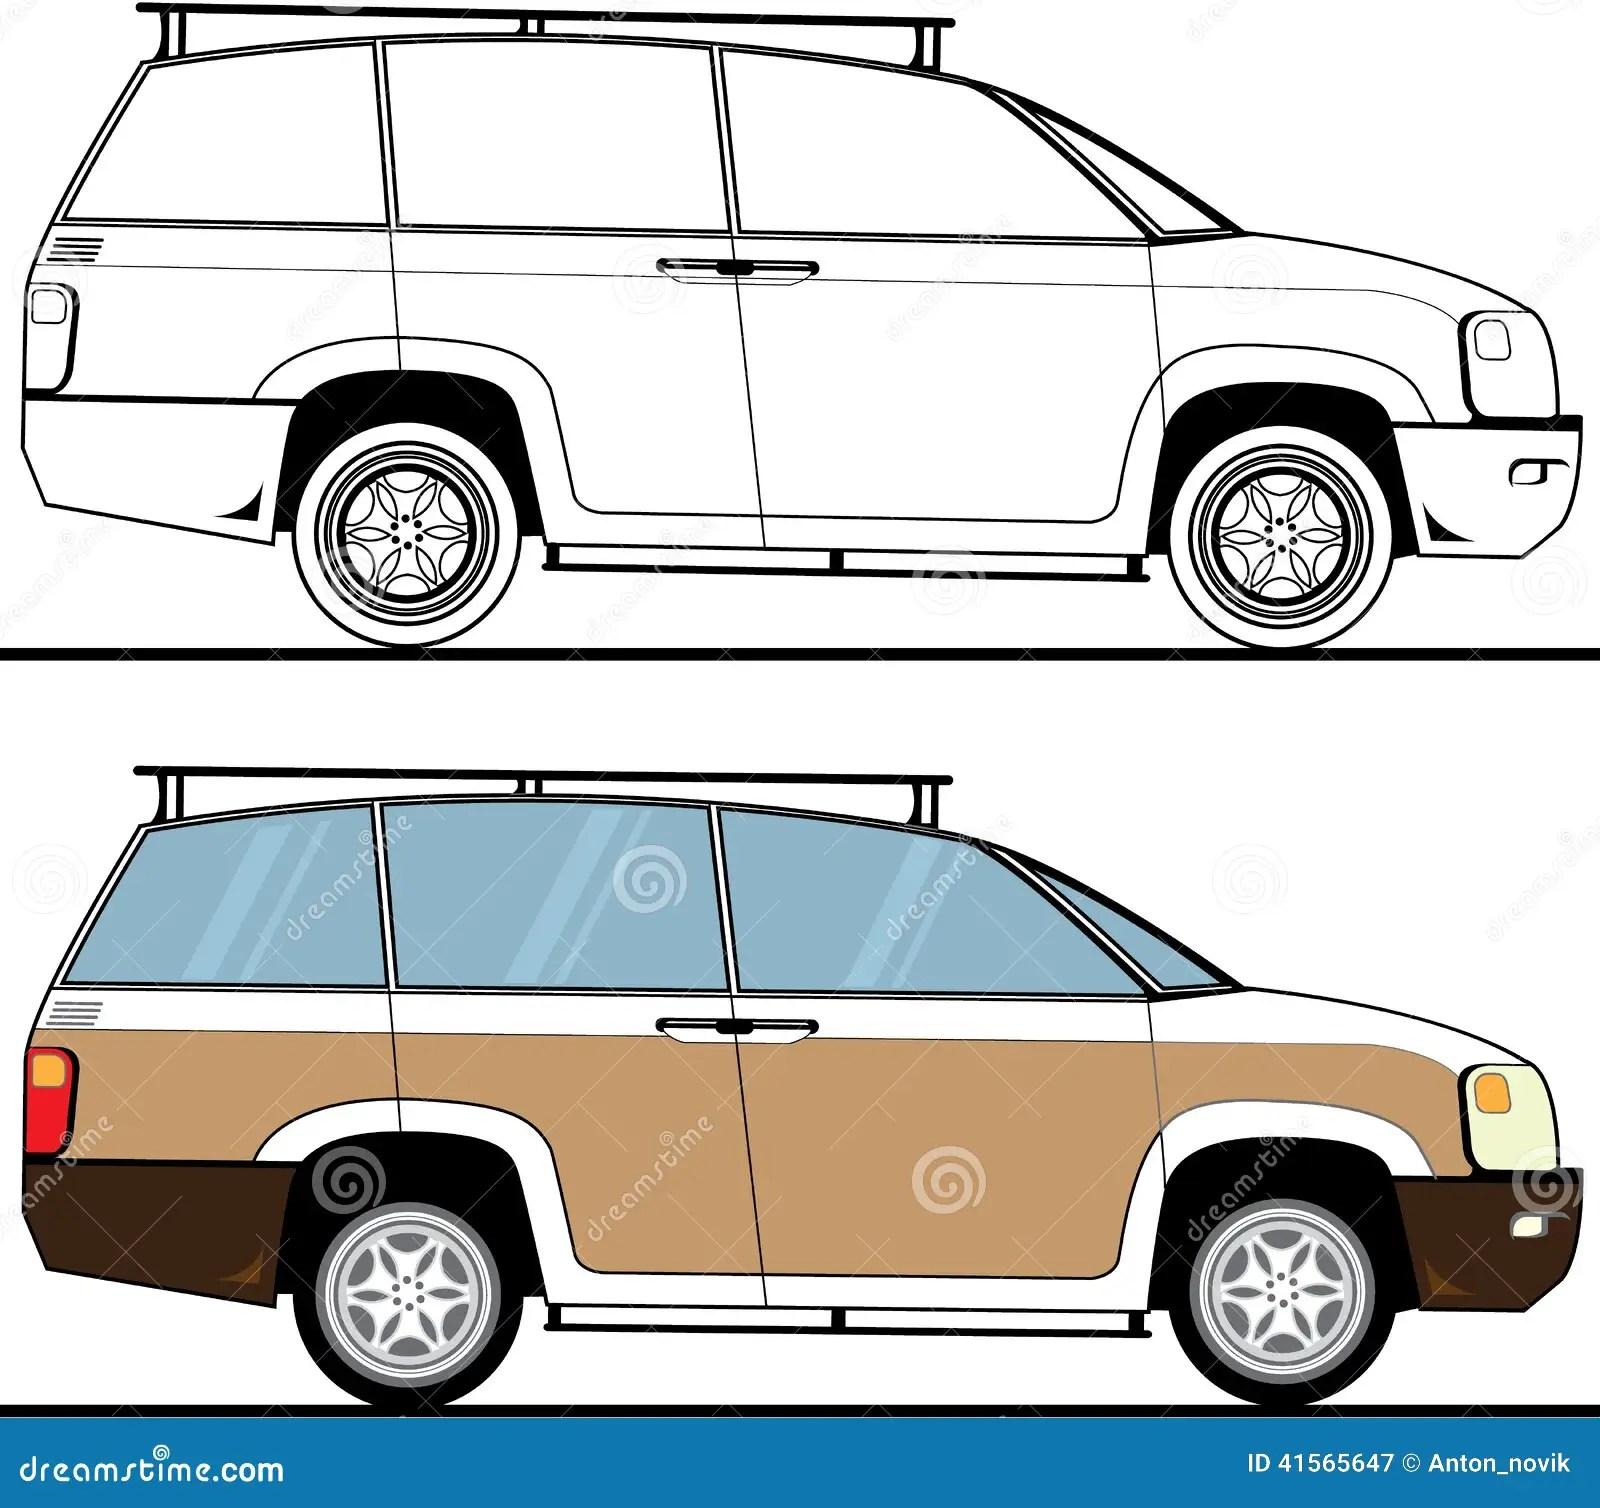 vehicle diagram clip art solid mensuration formulas with diagrams suv color stock vector image of auto alternative future